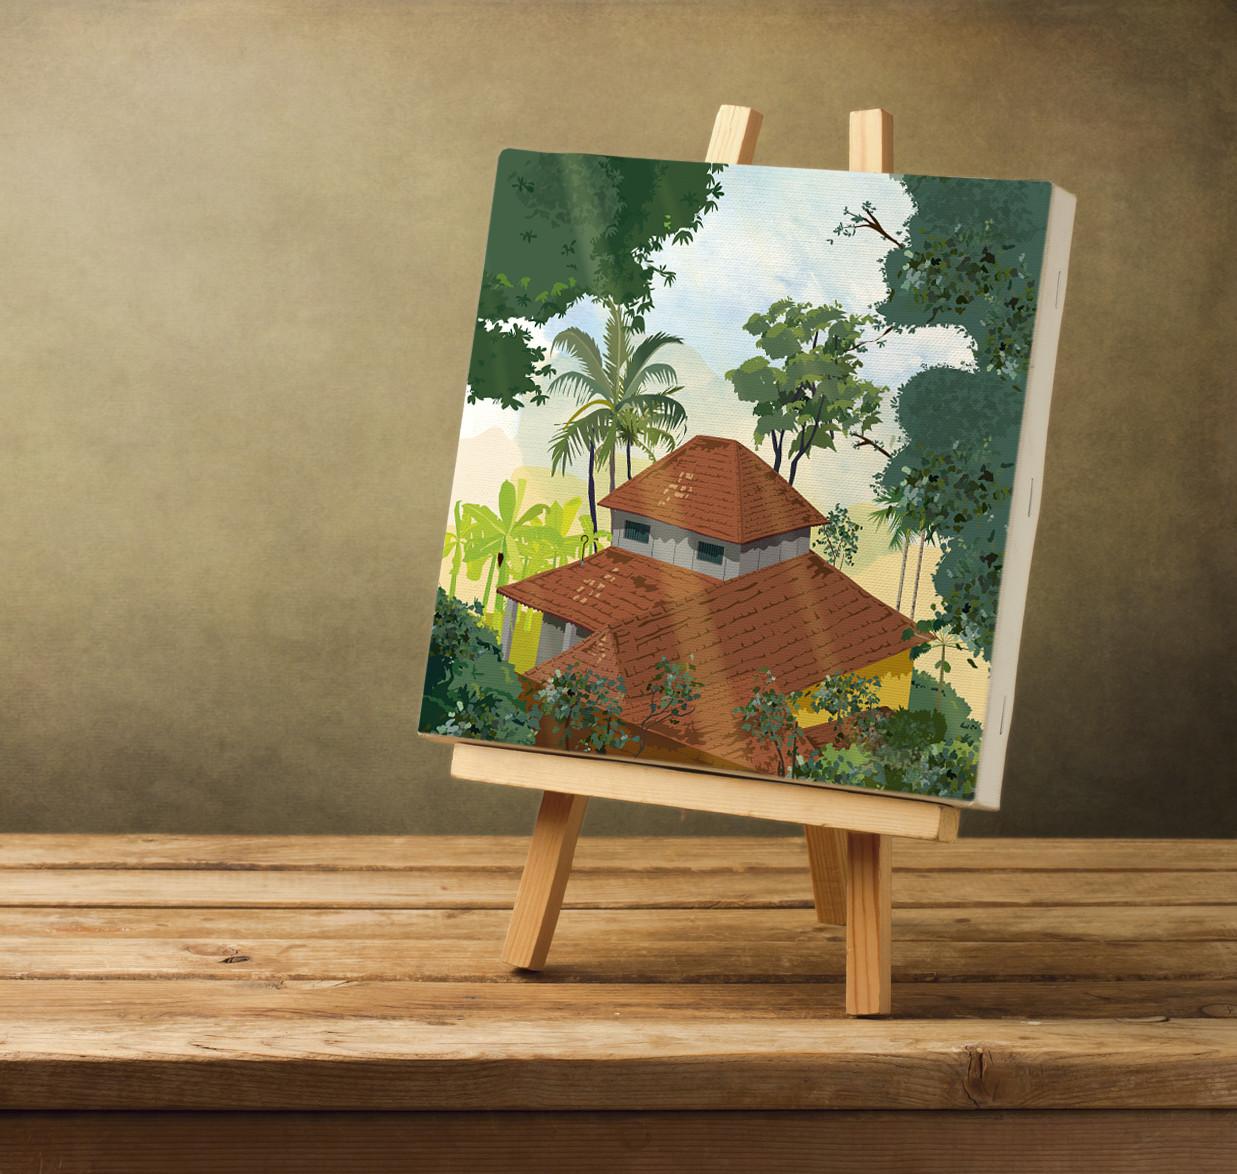 Rajesh r sawant blank canvas1